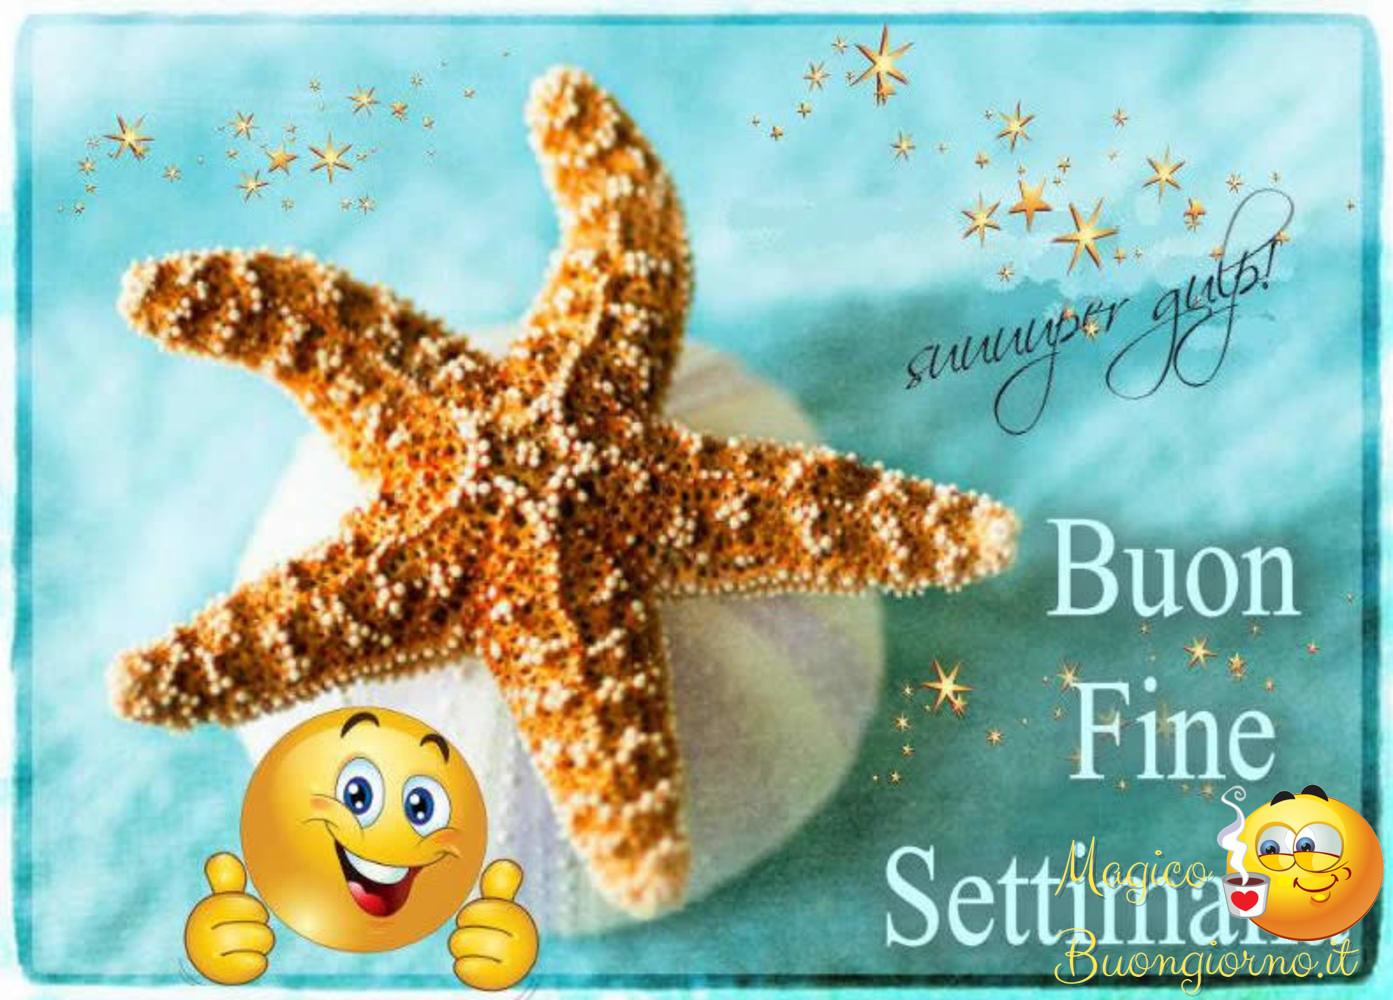 Immagini per Whatsapp Facebook Buon Week-End fine Settimana 17